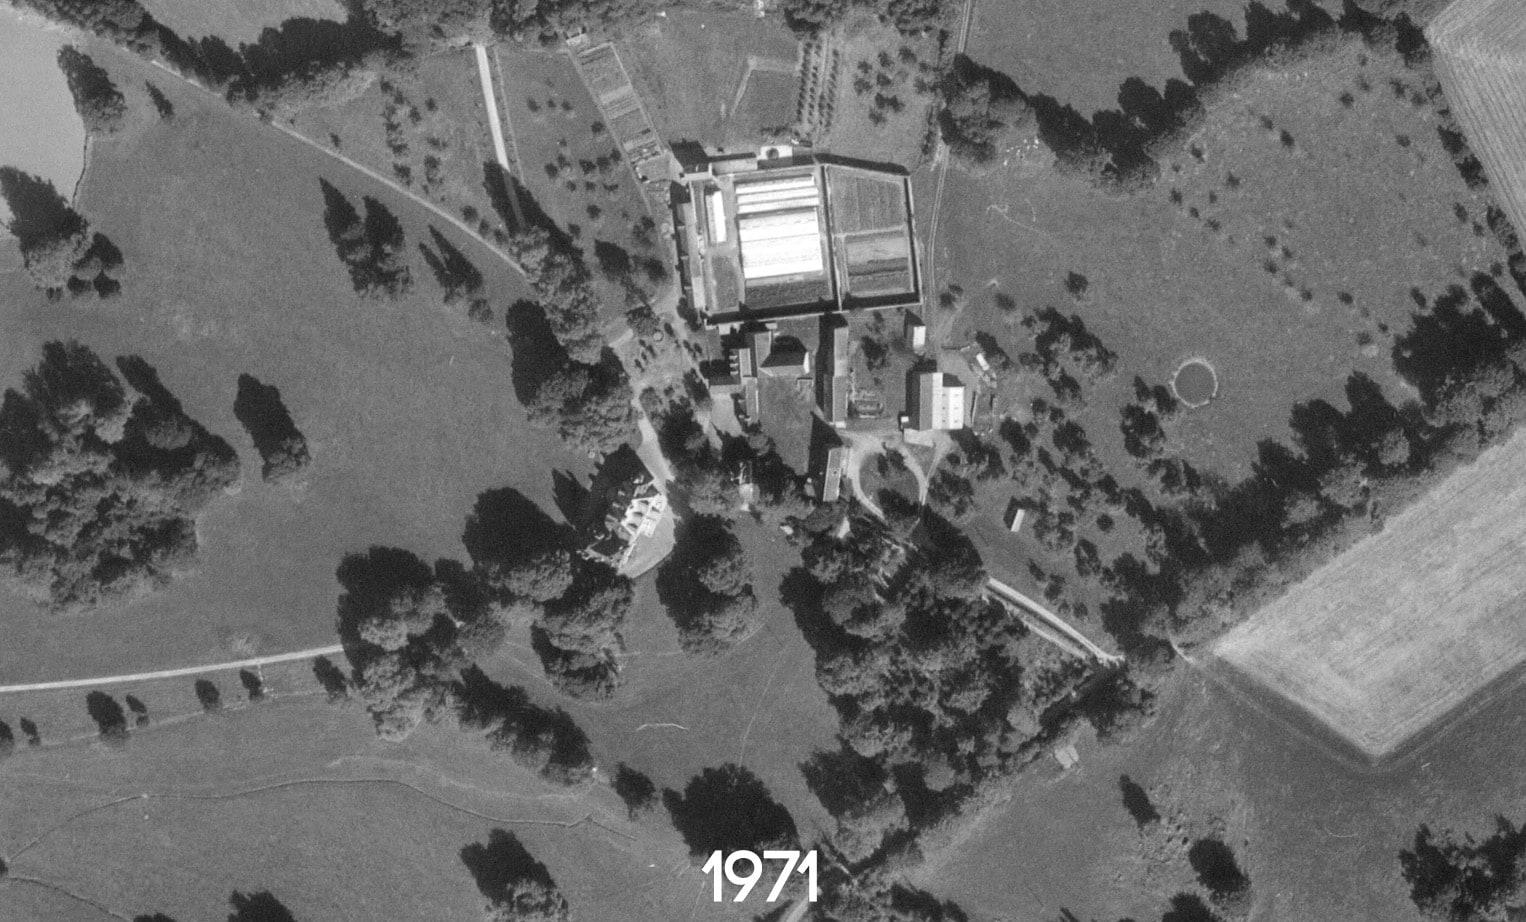 chateau-marko-bey-before-map-1971